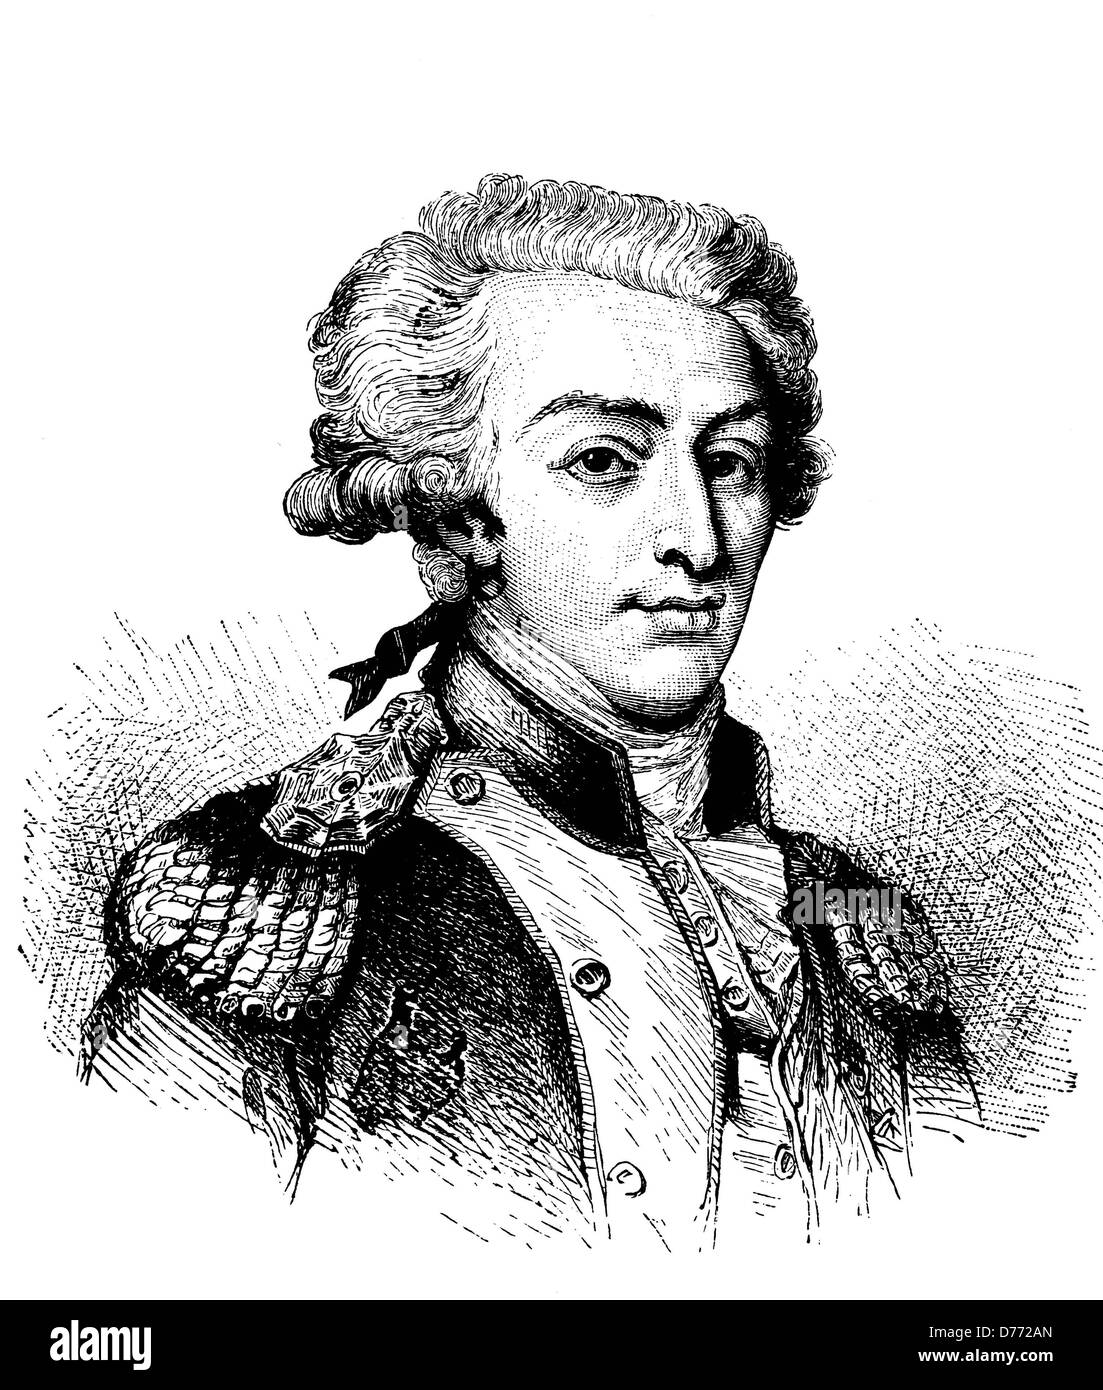 Marie Josef Paul de Lafayette, 1757 - 1834, French politician, historical woodcut, circa 1880 - Stock Image